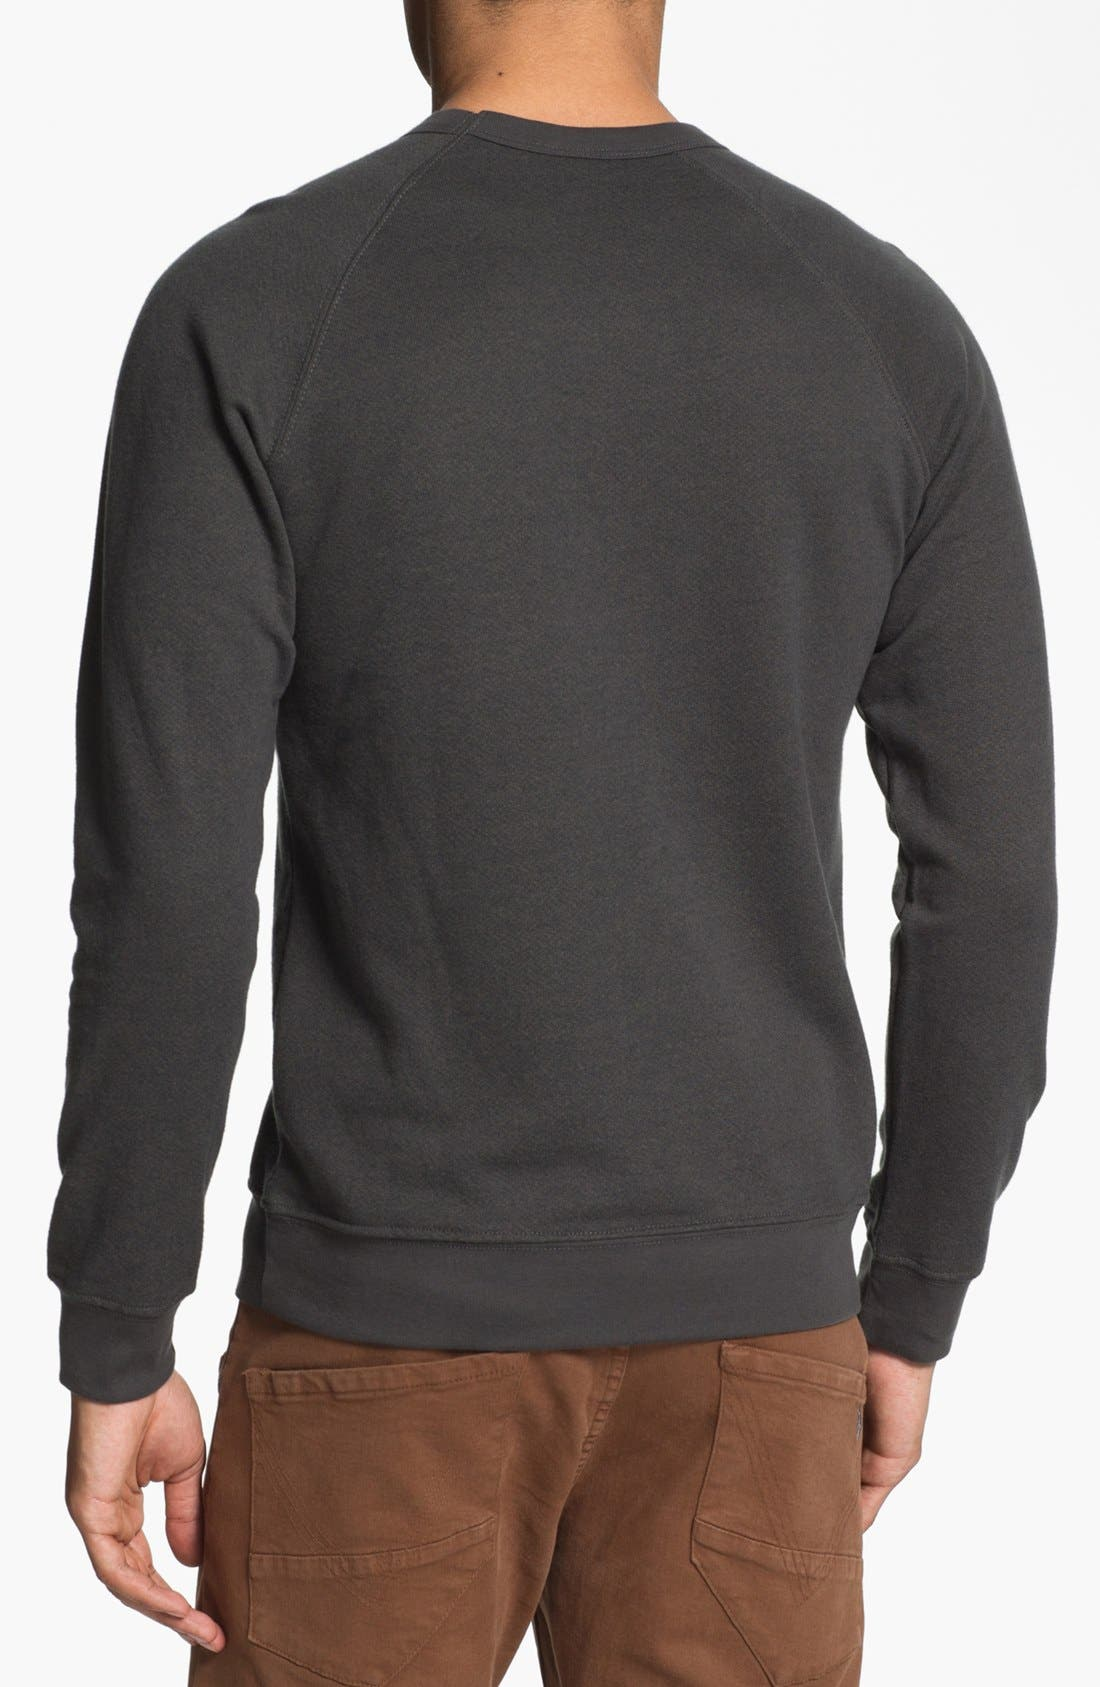 Alternate Image 2  - Obey 'College Crest' Graphic Crewneck Sweatshirt.